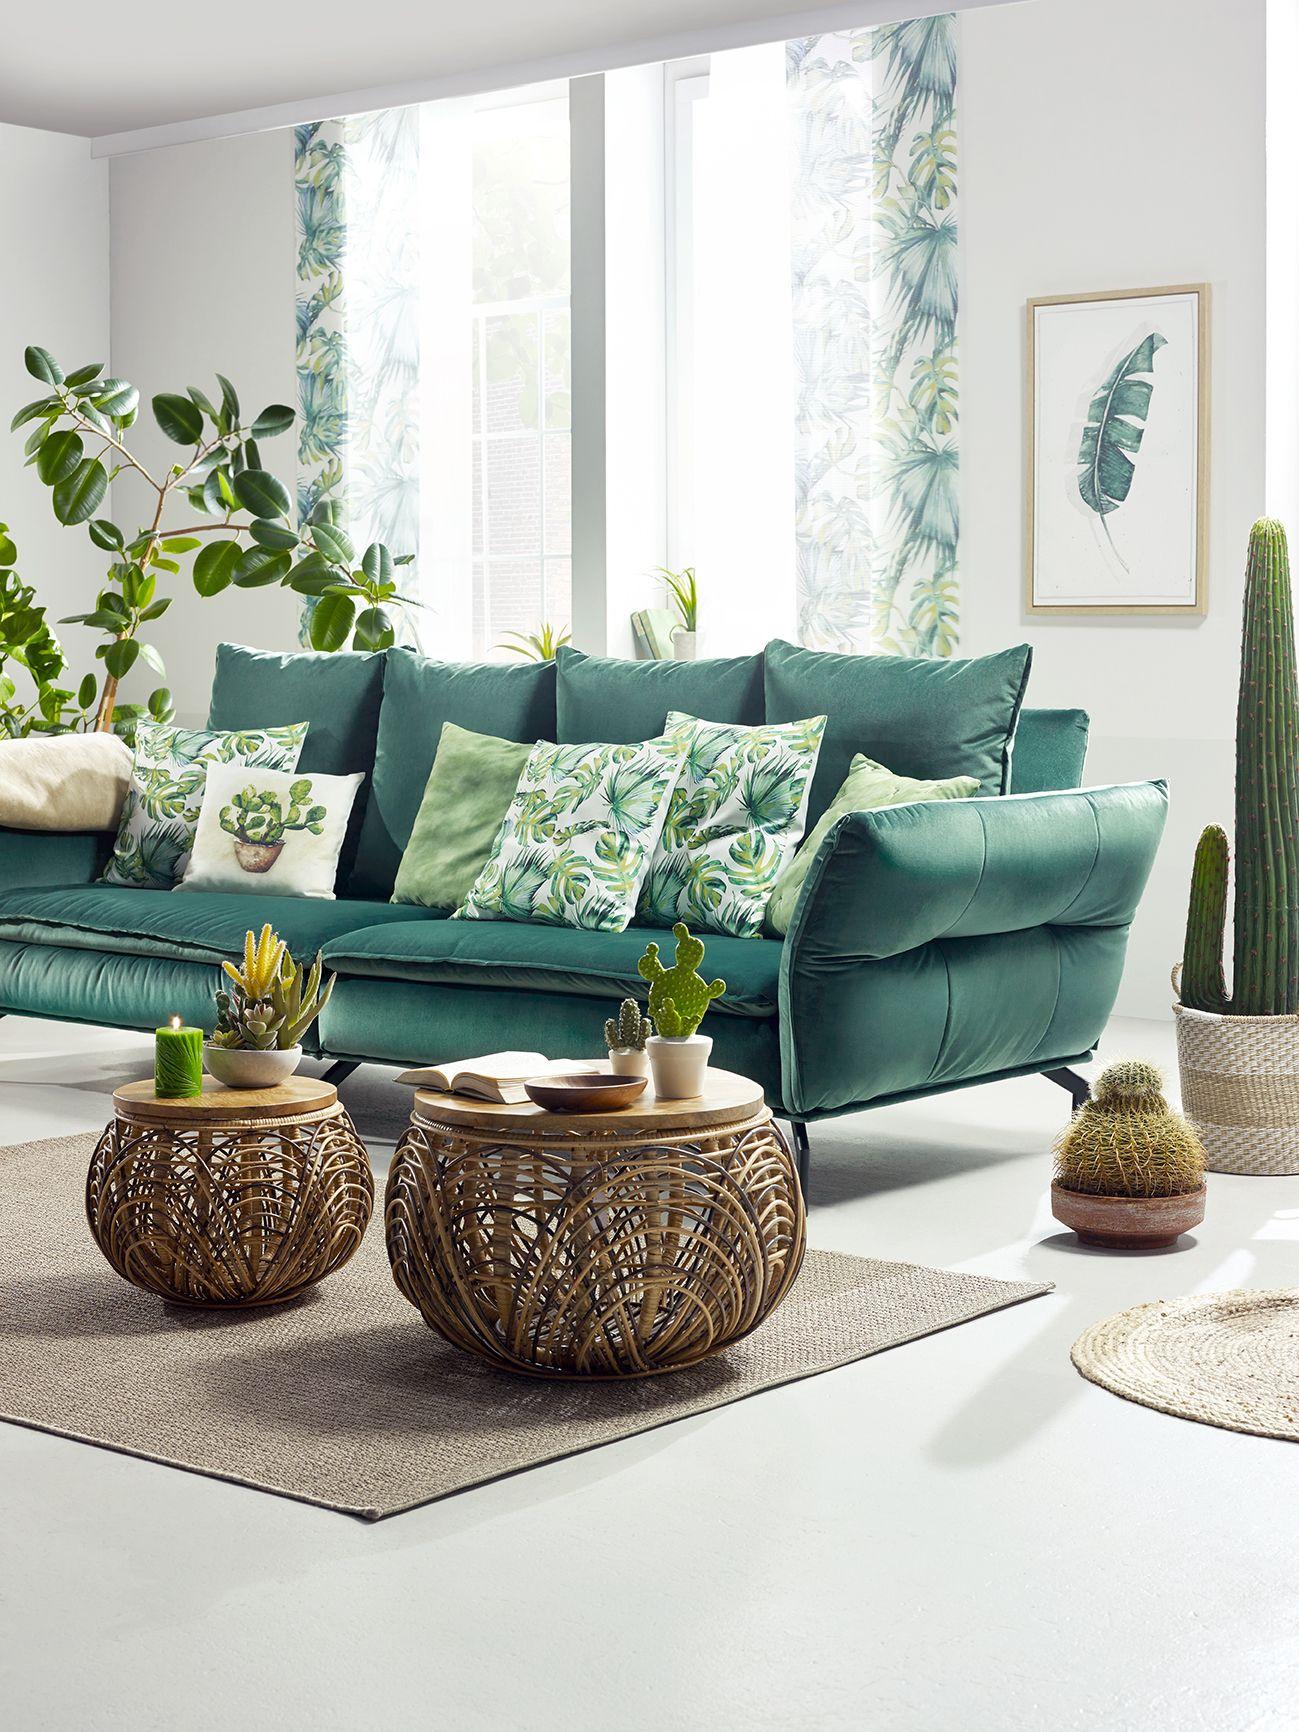 63 Botanic Summer Ideen Tropen Dekoration Zuhause